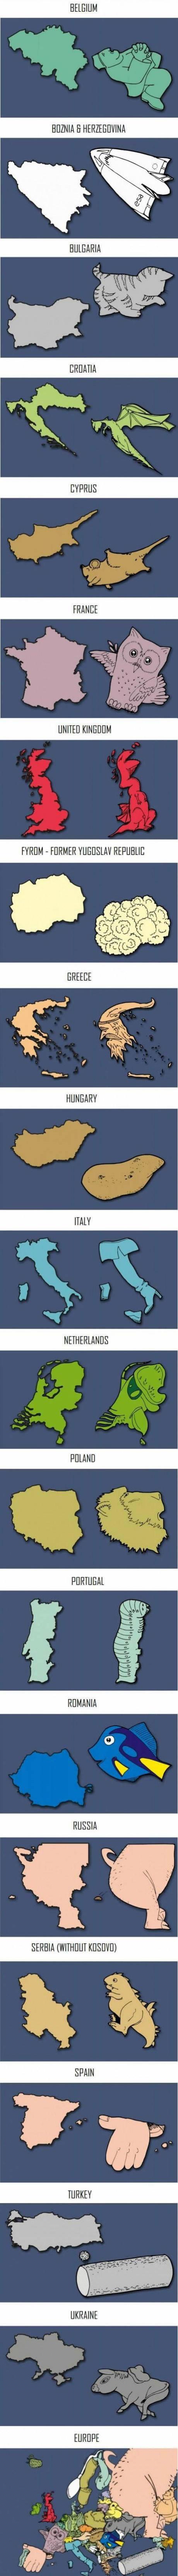 europe, flag, totallylookslike, compilation